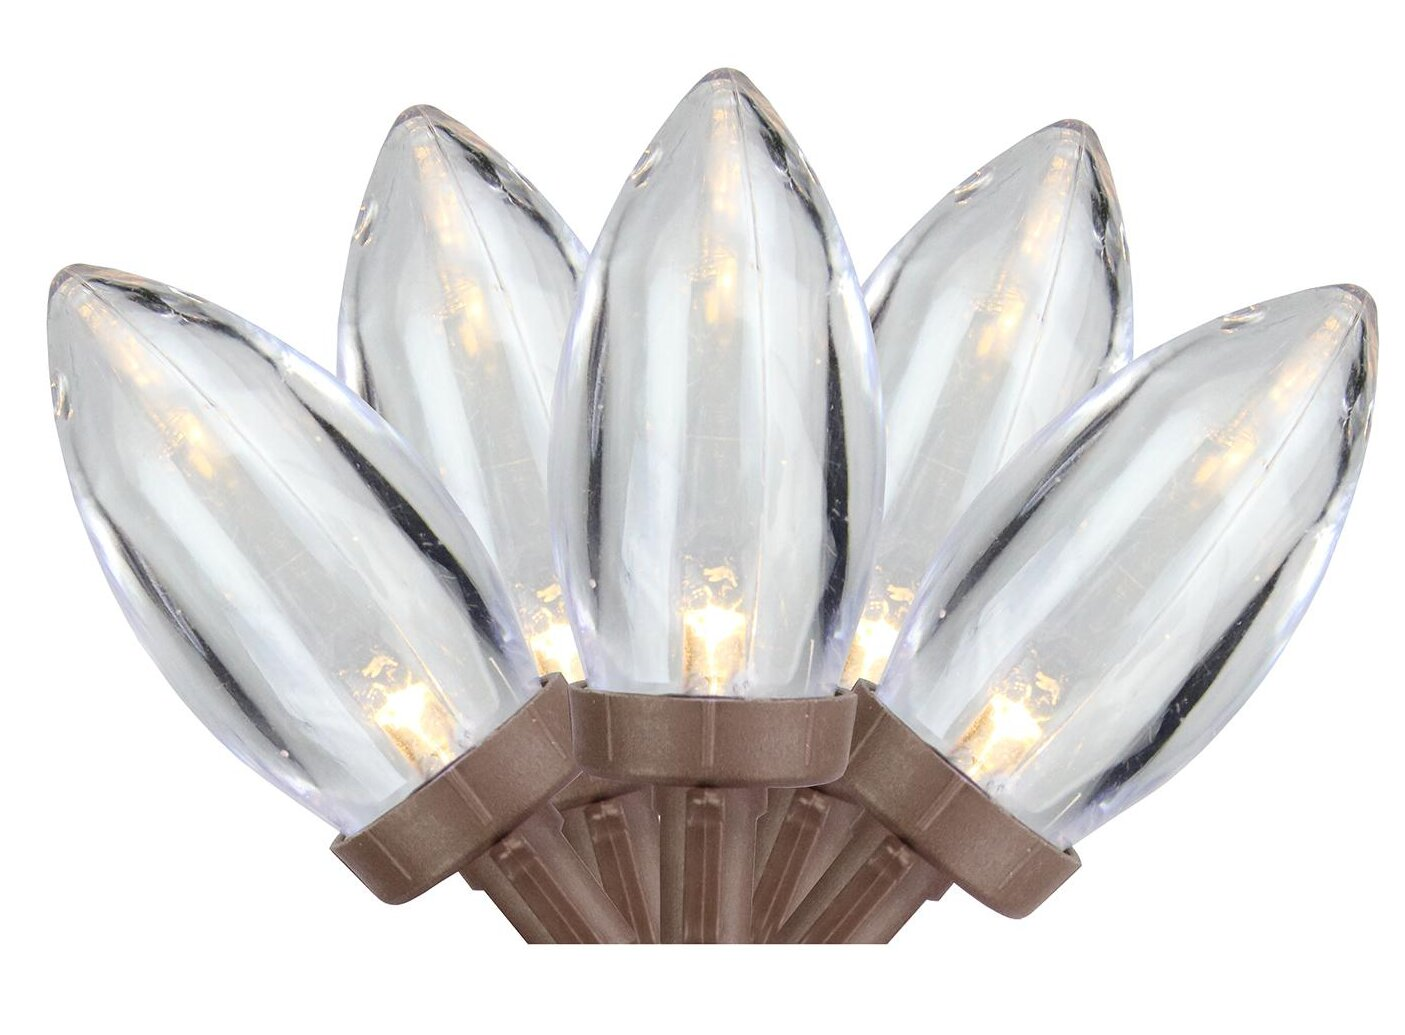 Jumbo Plug In Christmas Lights You Ll Love In 2021 Wayfair